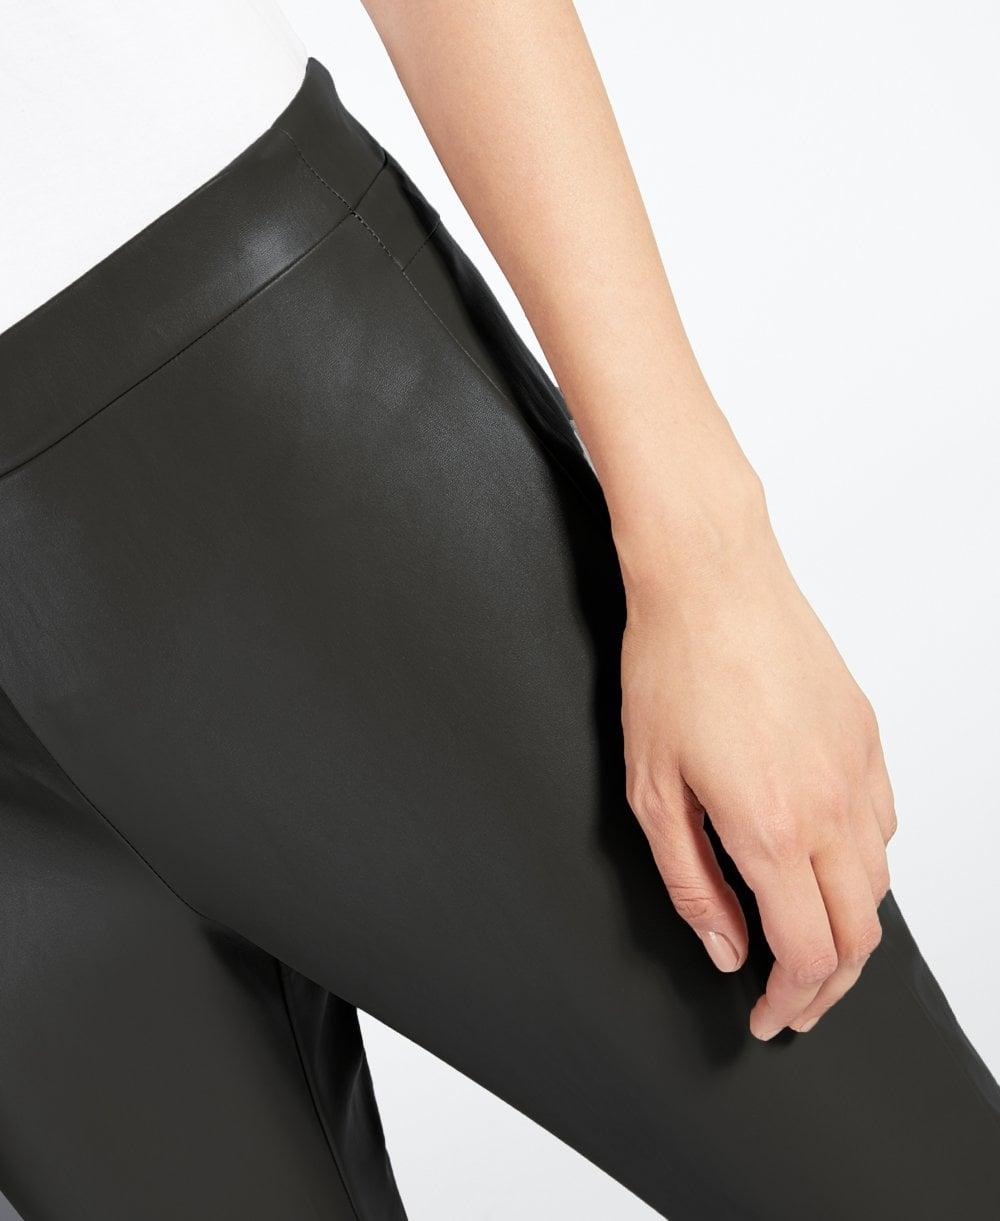 d3248b15165d2 MaxMara Darsena Leather Look Leggings - Leggings from luxury-legs.com UK